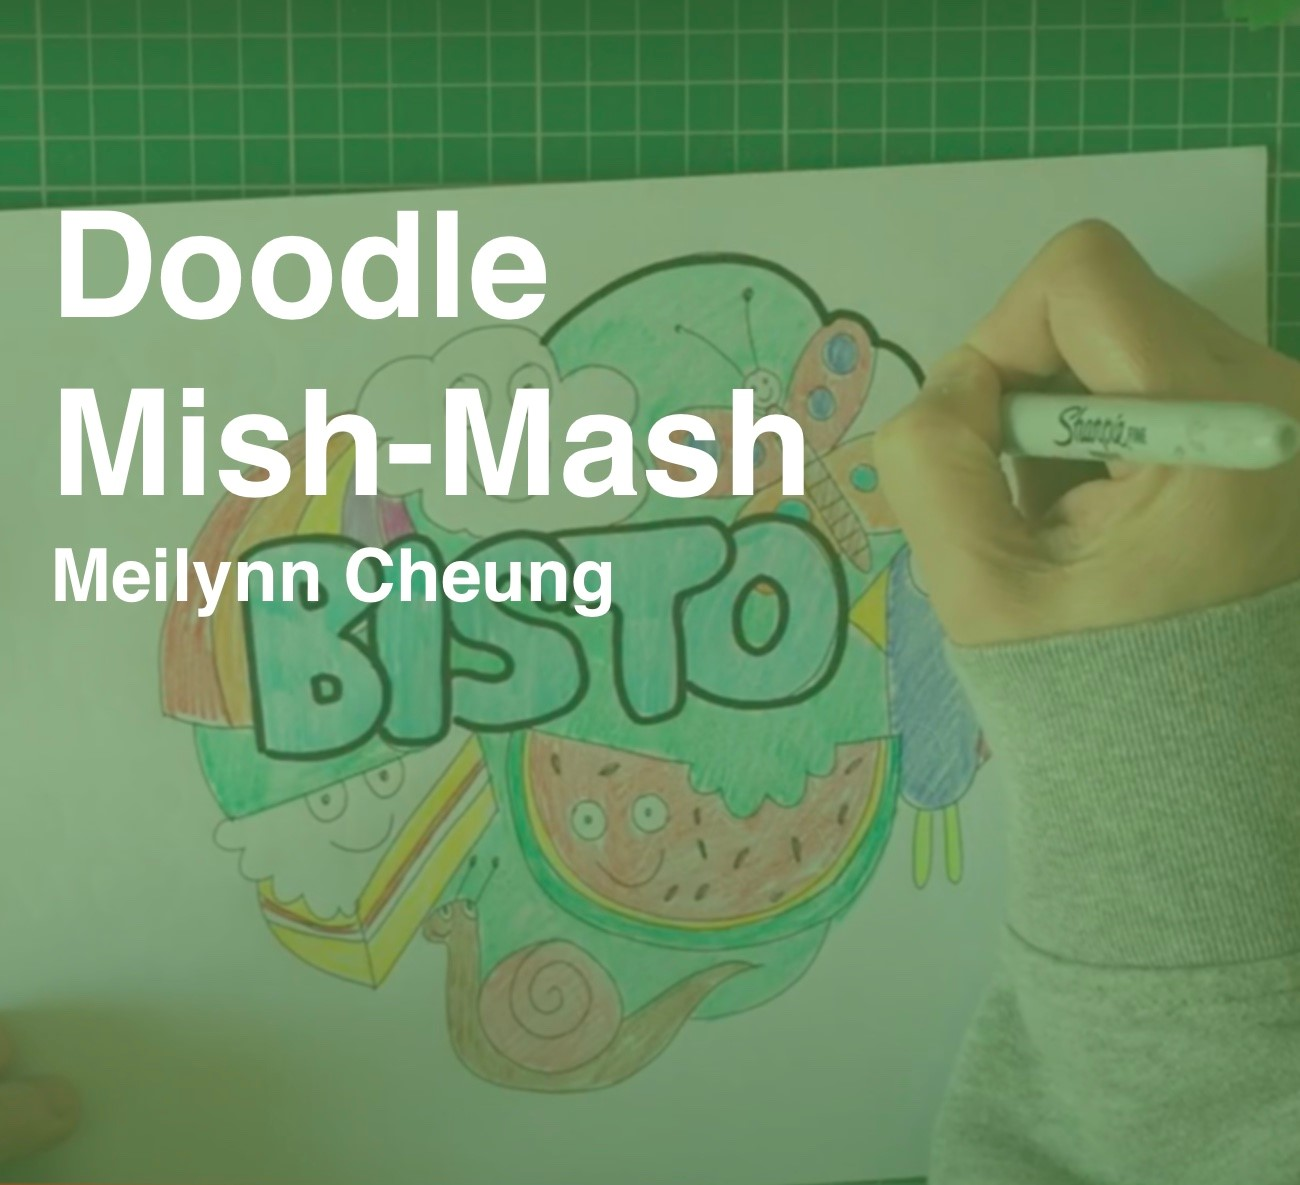 Friday Art Class - Doodle Mish Mash